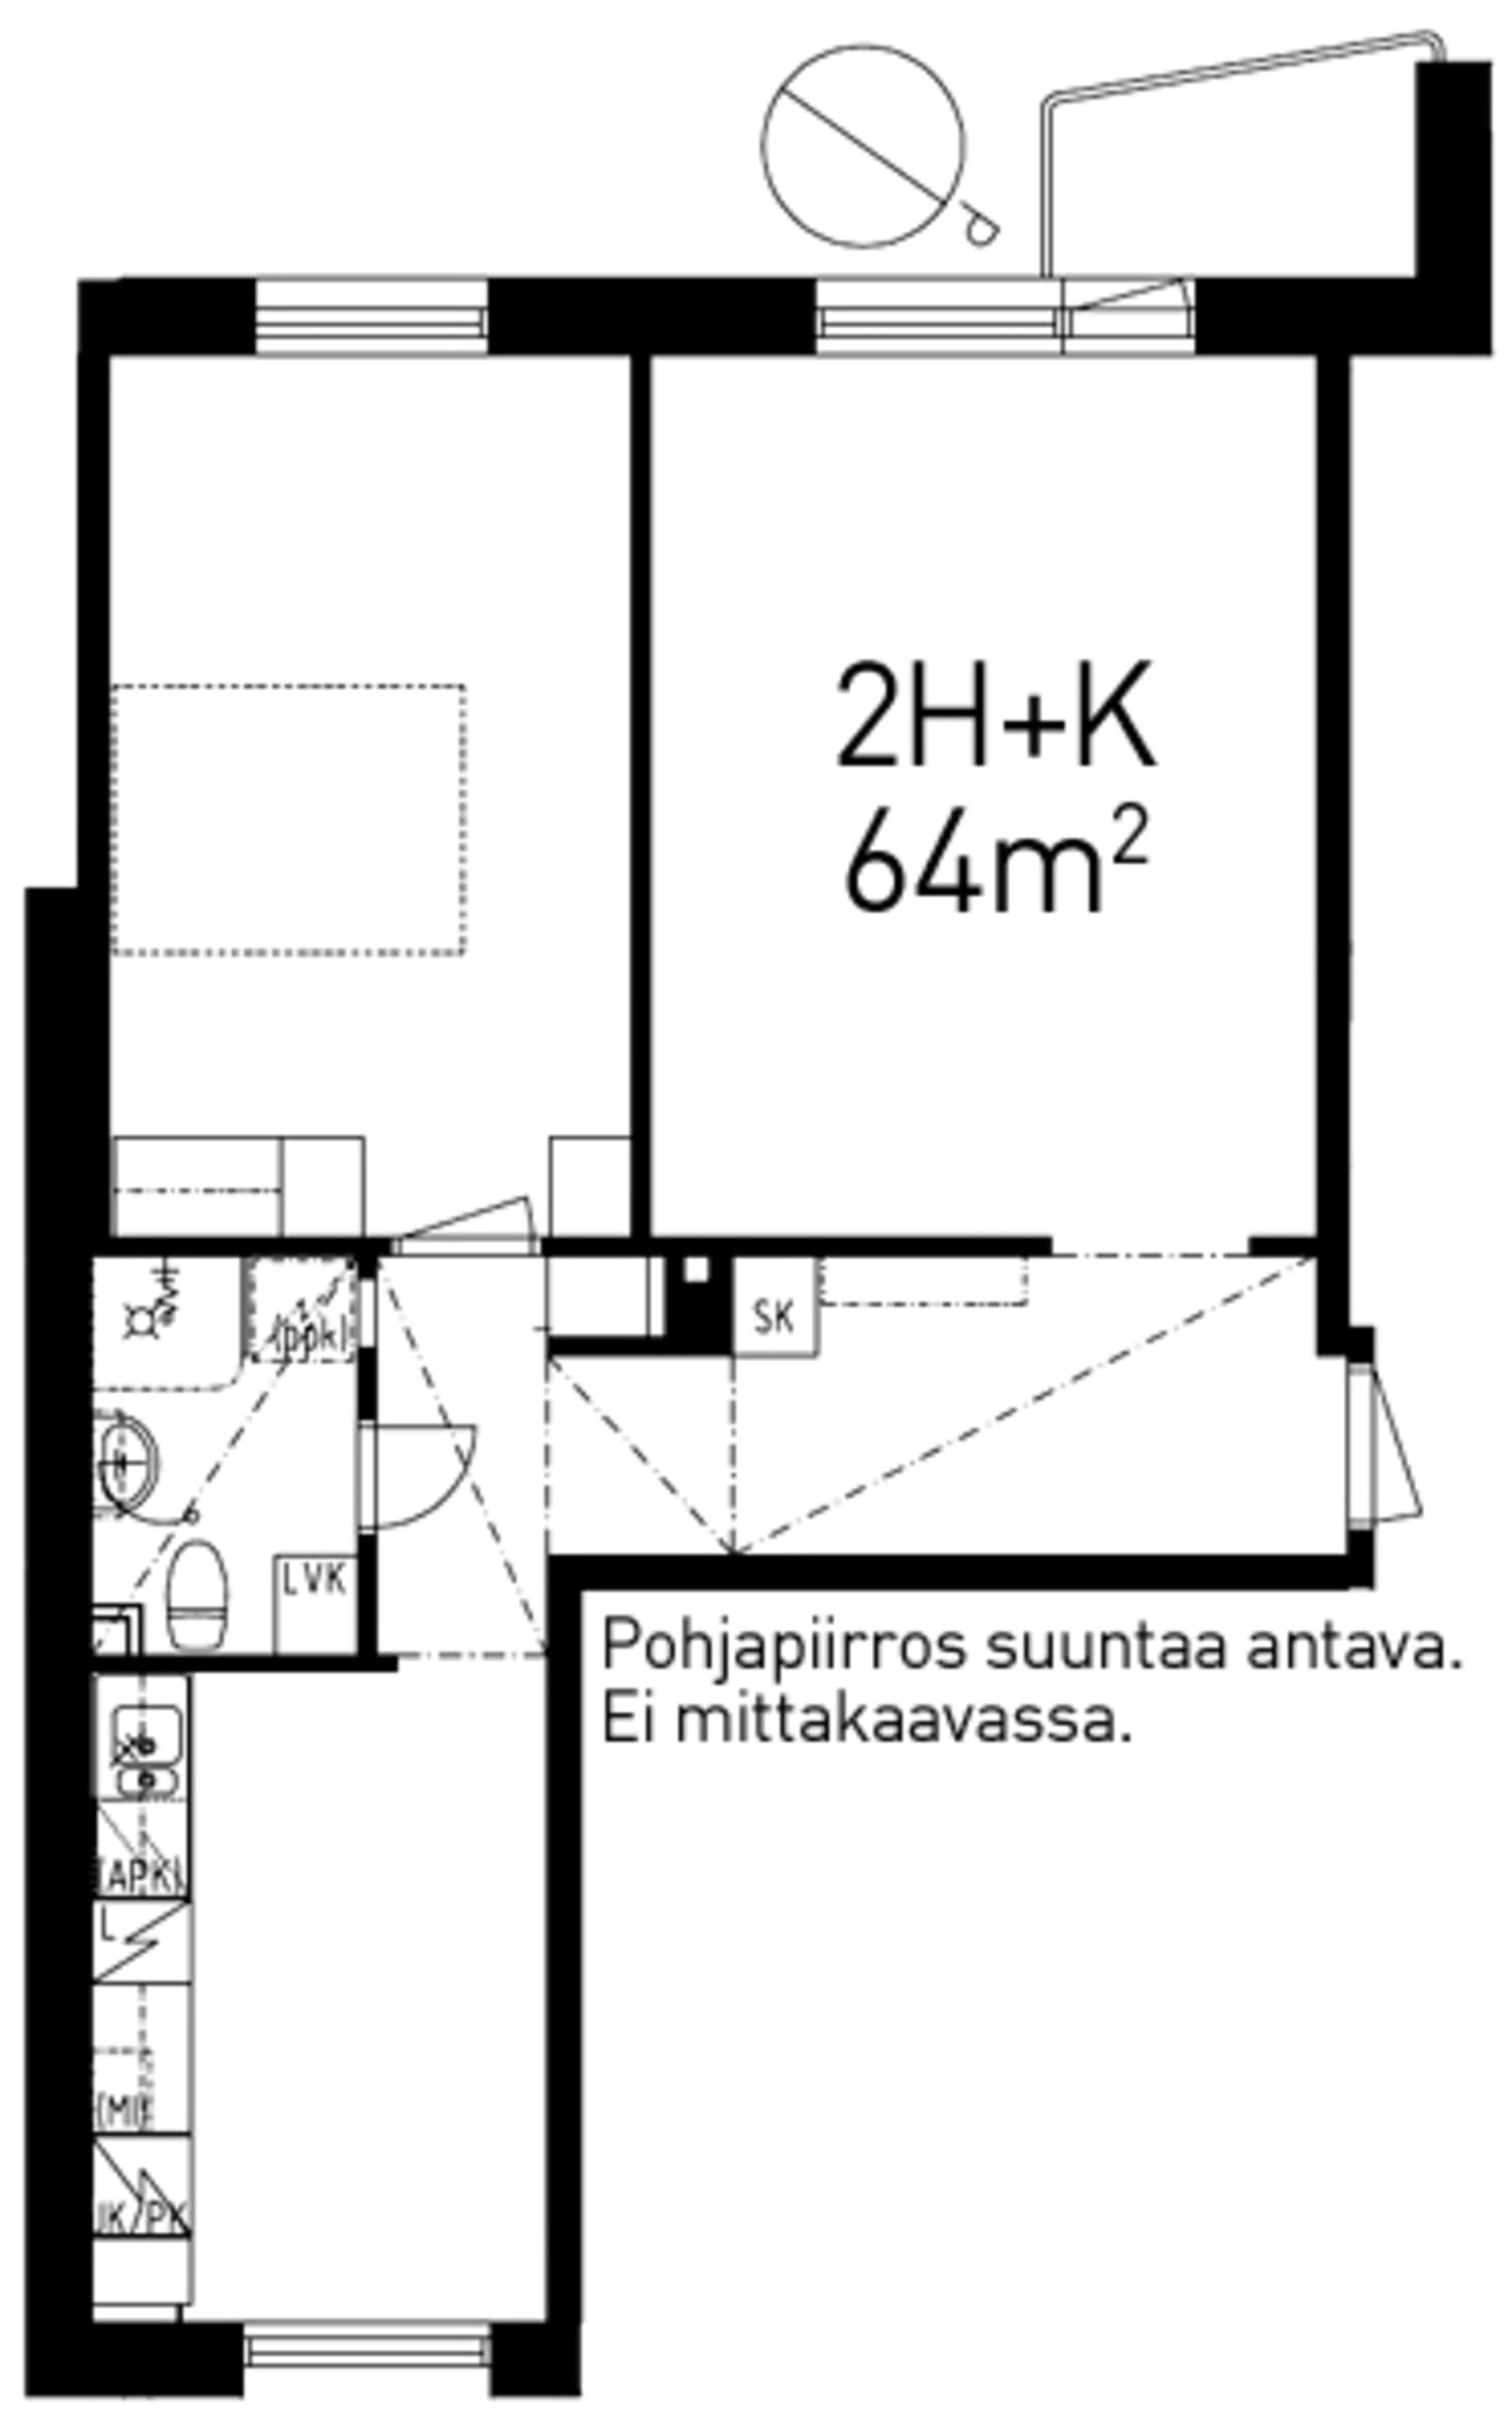 Turku, Keskusta, Uudenmaankatu 13 A 032